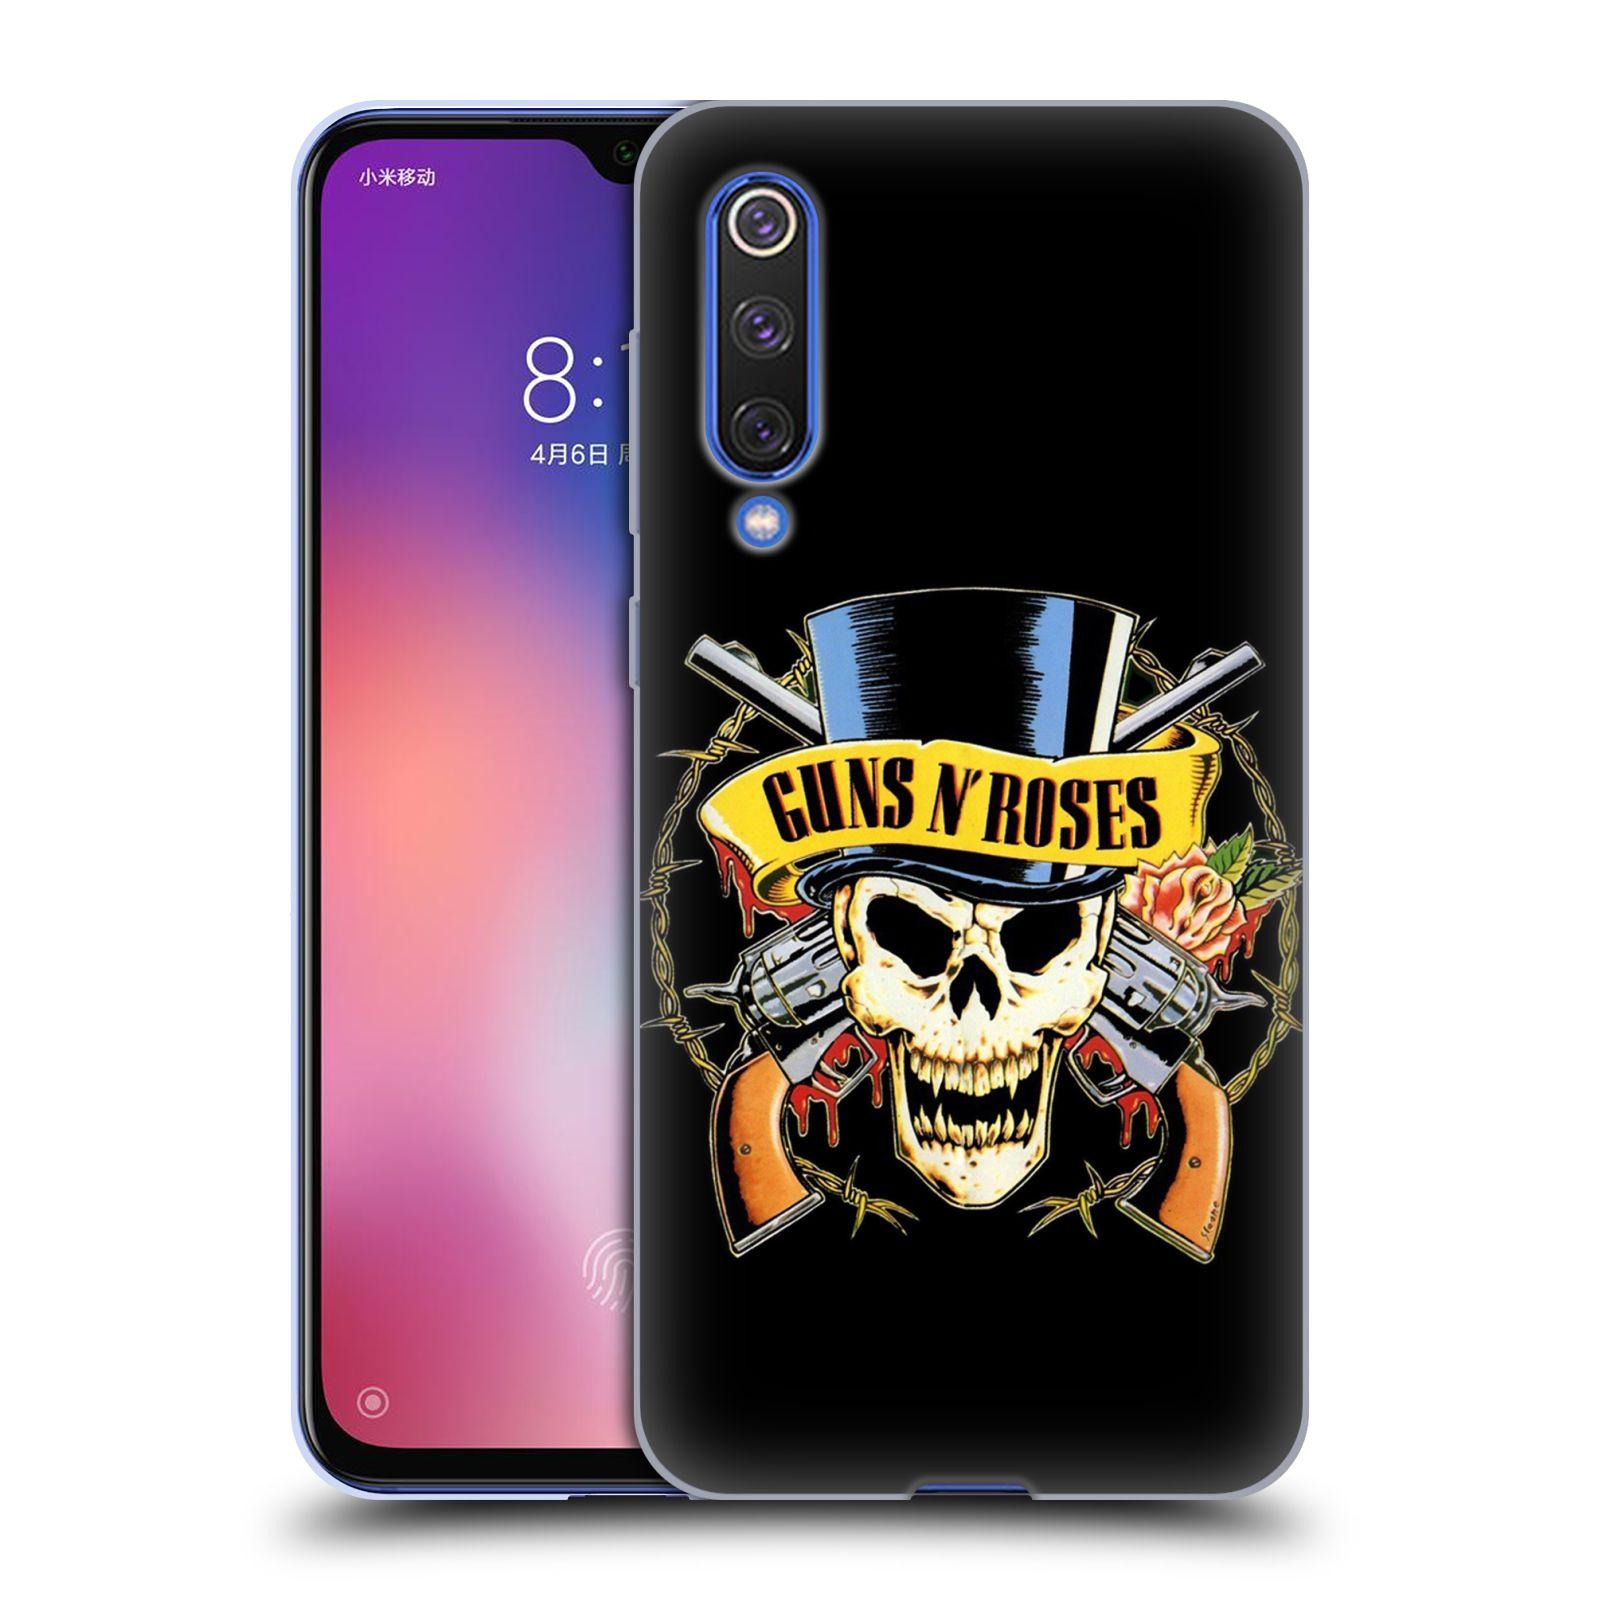 Silikonové pouzdro na mobil Xiaomi Mi 9 SE - Head Case - Guns N' Roses - Lebka